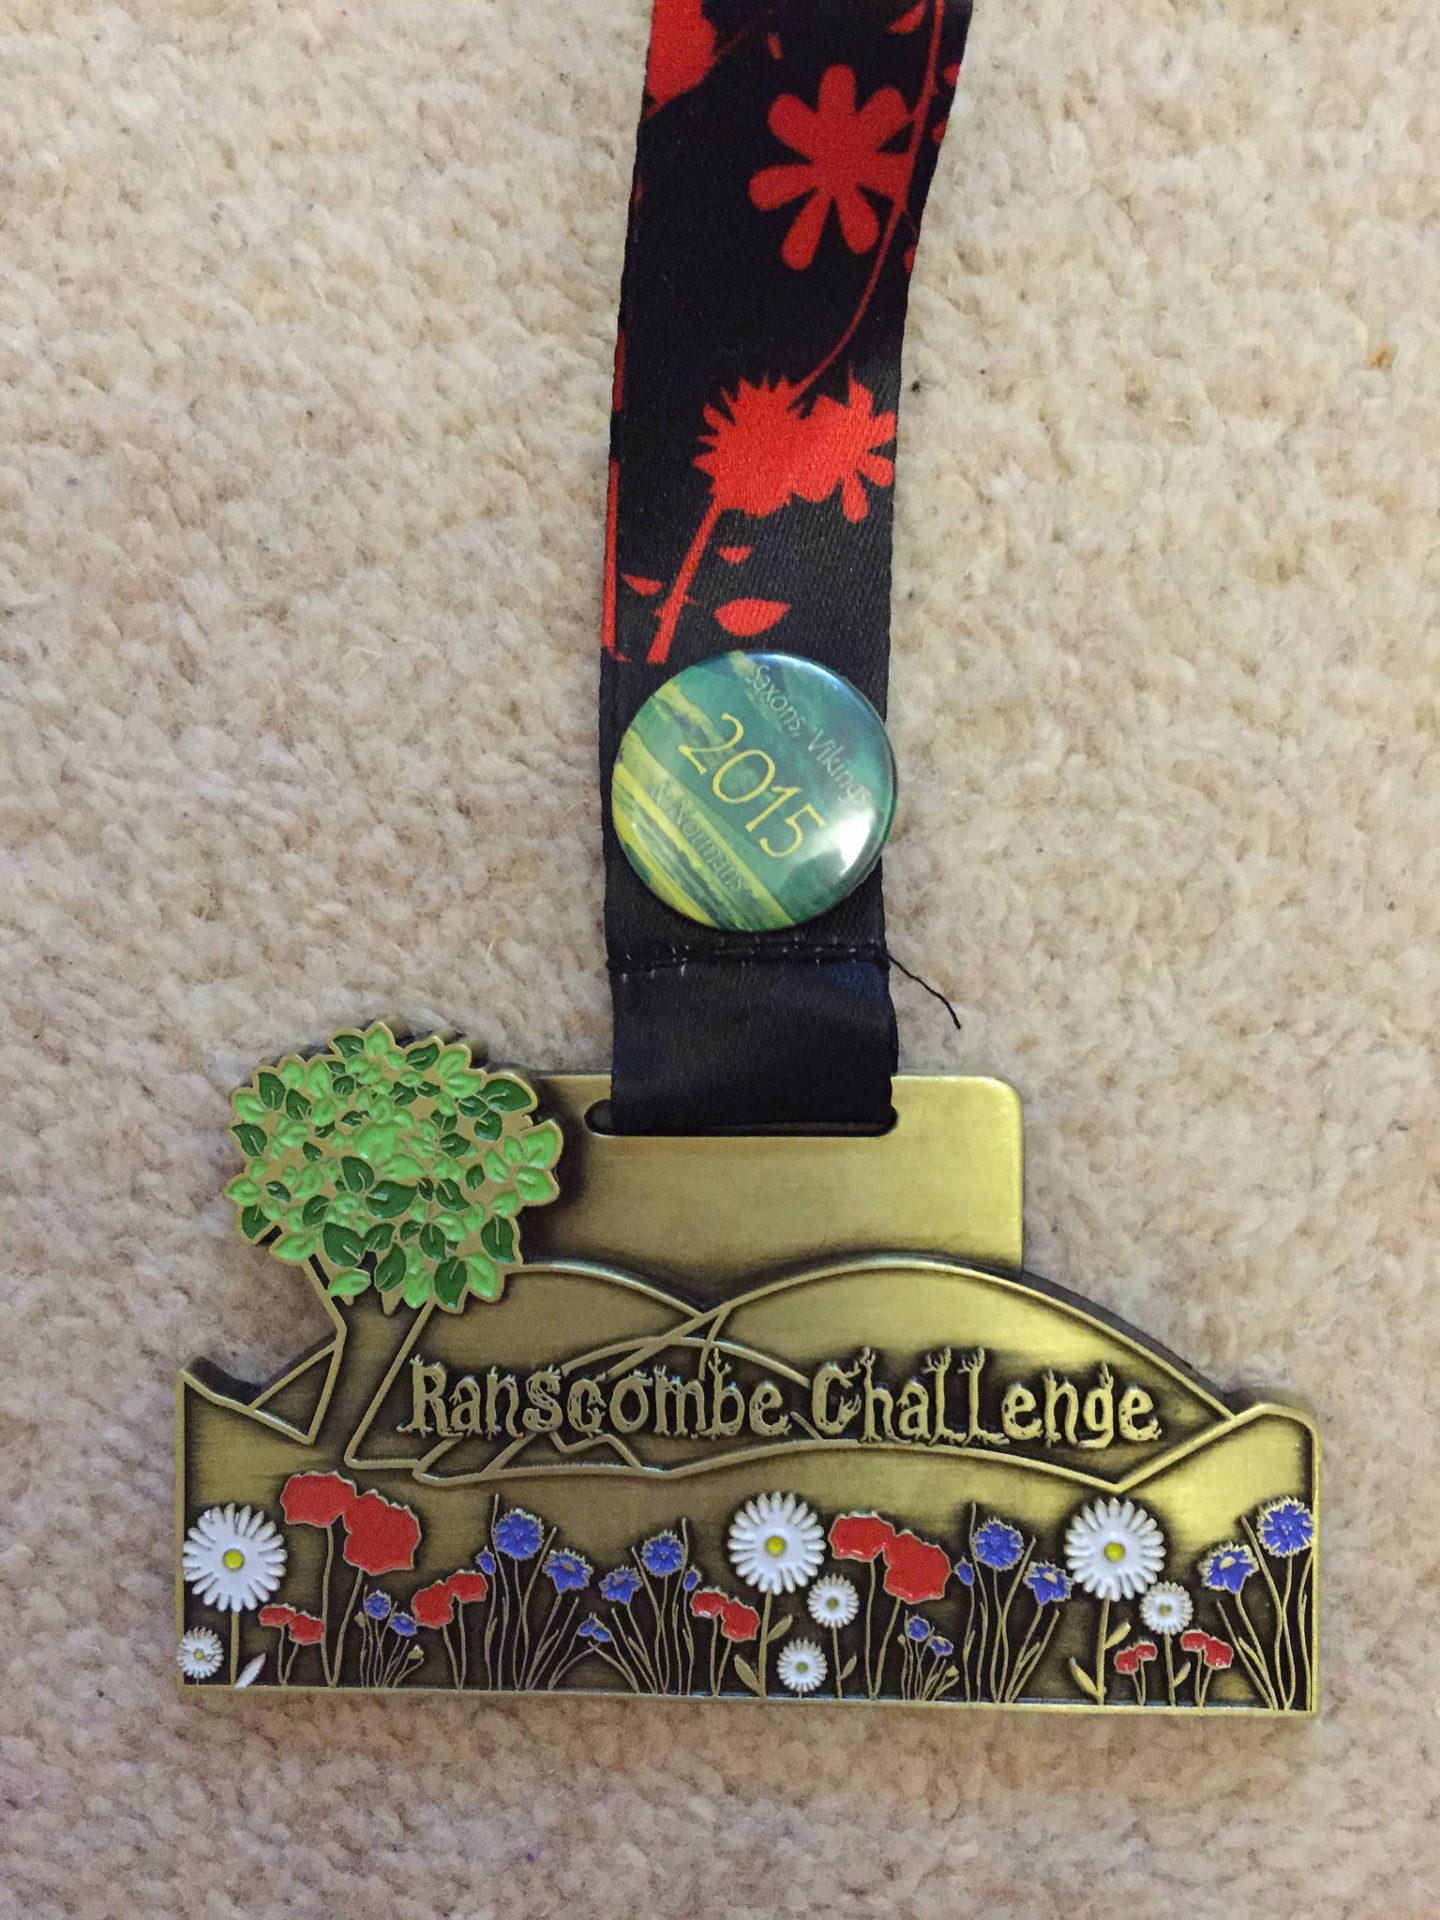 image - Ranscombe Summer Challenge Medal